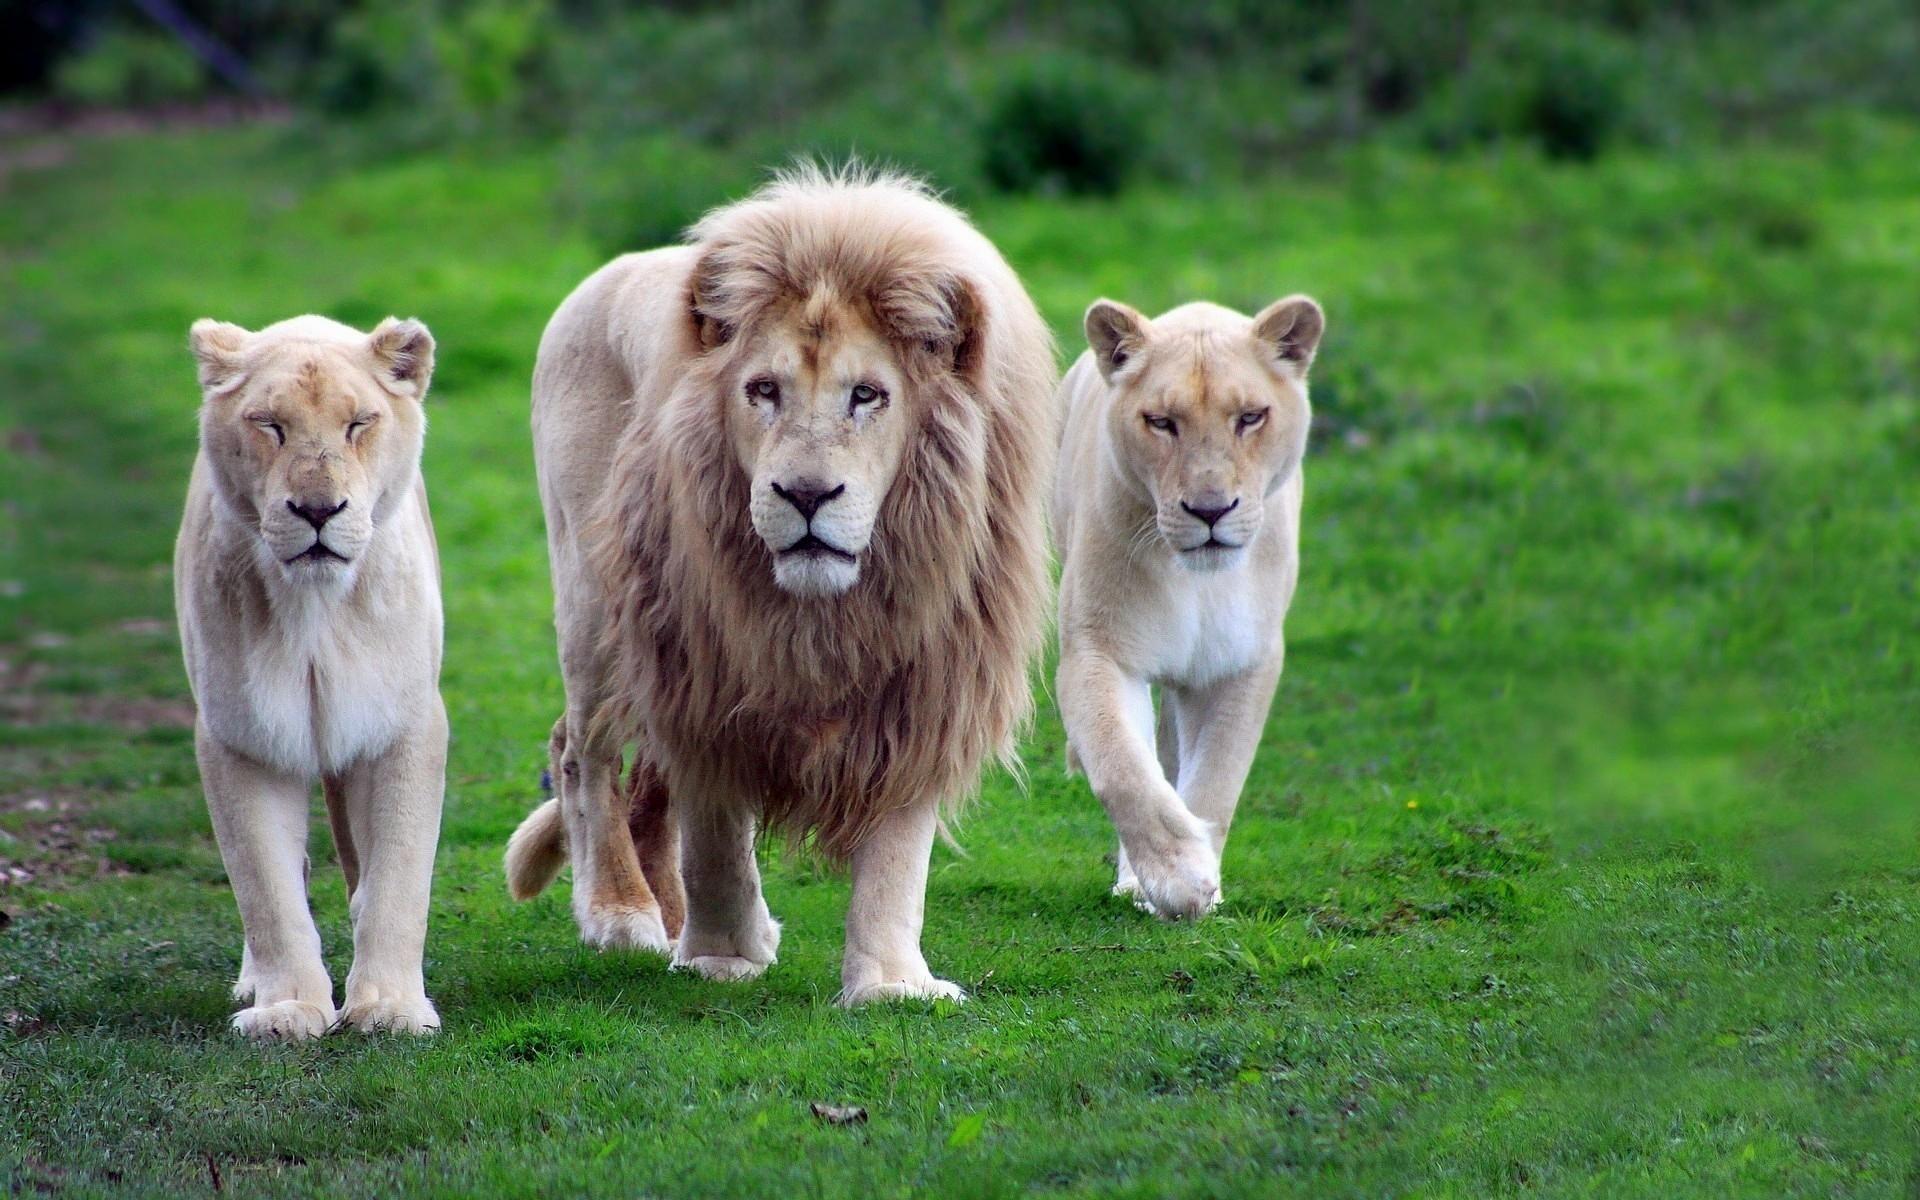 Lion-animals-wallpaper-images-dowload